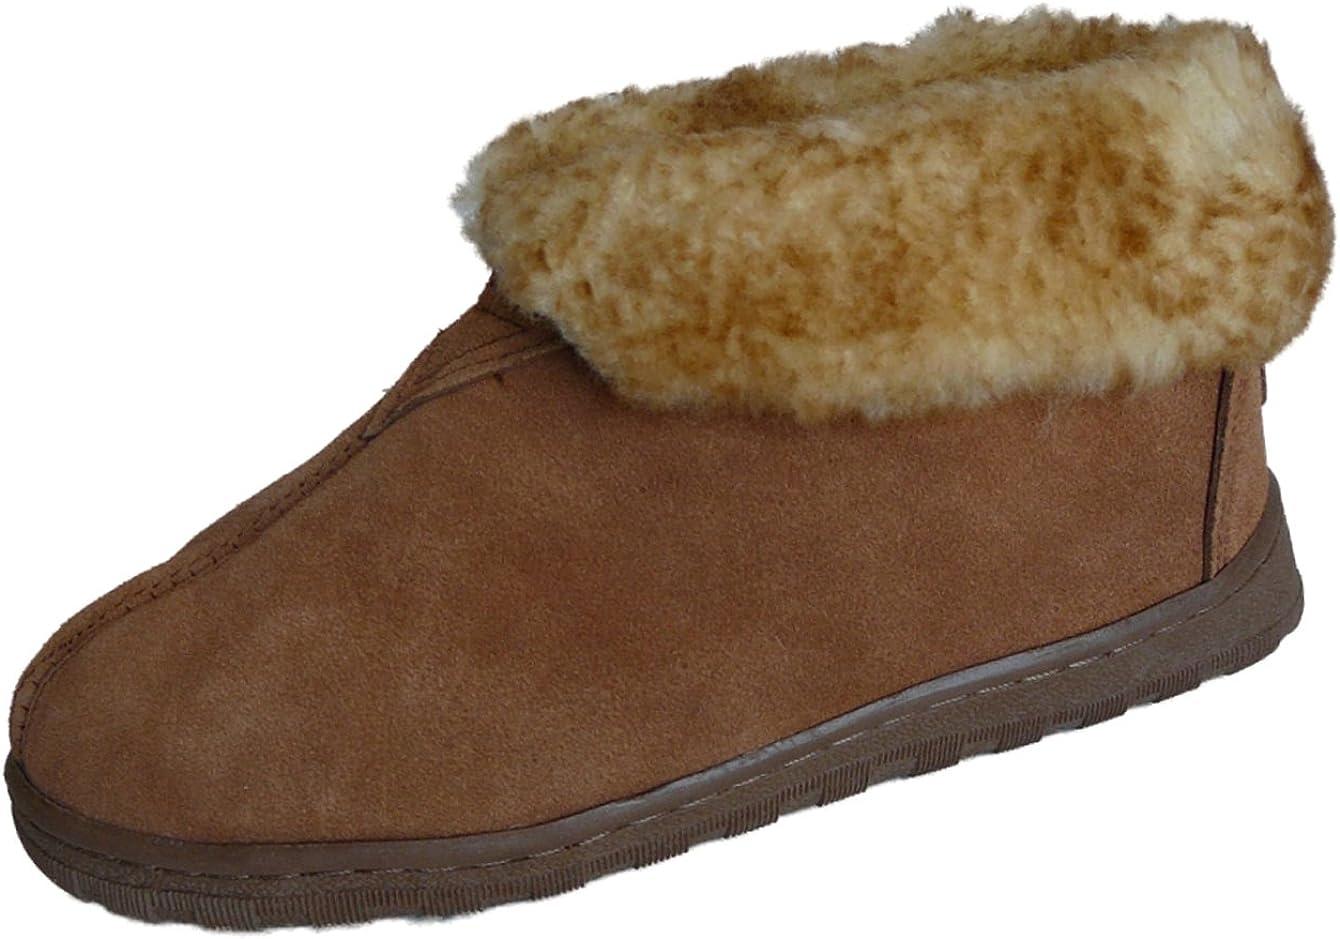 Ladies SHEEPSKIN Slippers Winter Womens HandMade Full Ankle Fluffy Wool Size 3-8